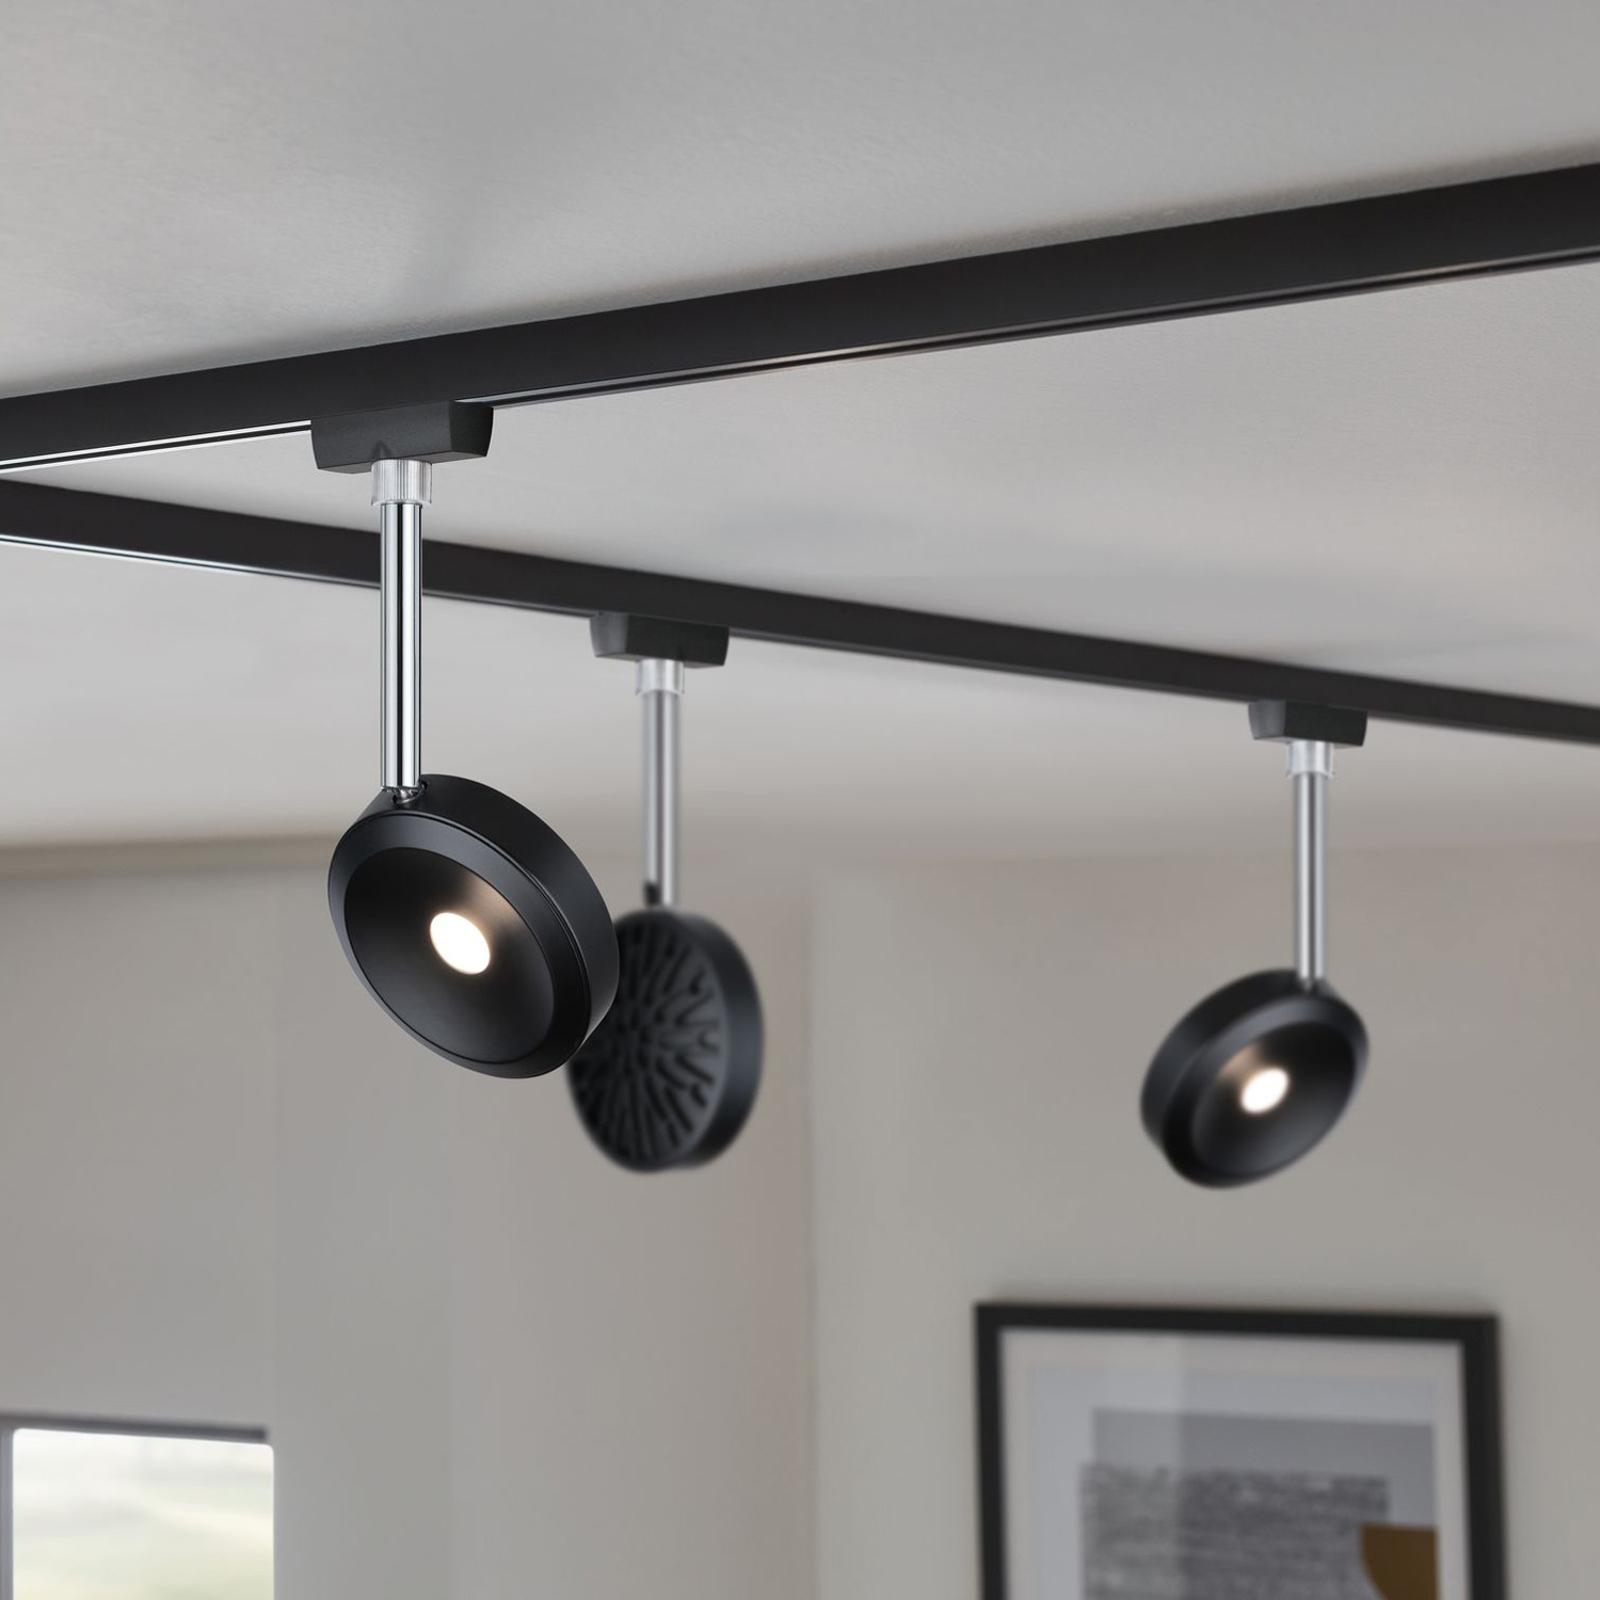 Paulmann URail spot LED Discus noir, dimmable